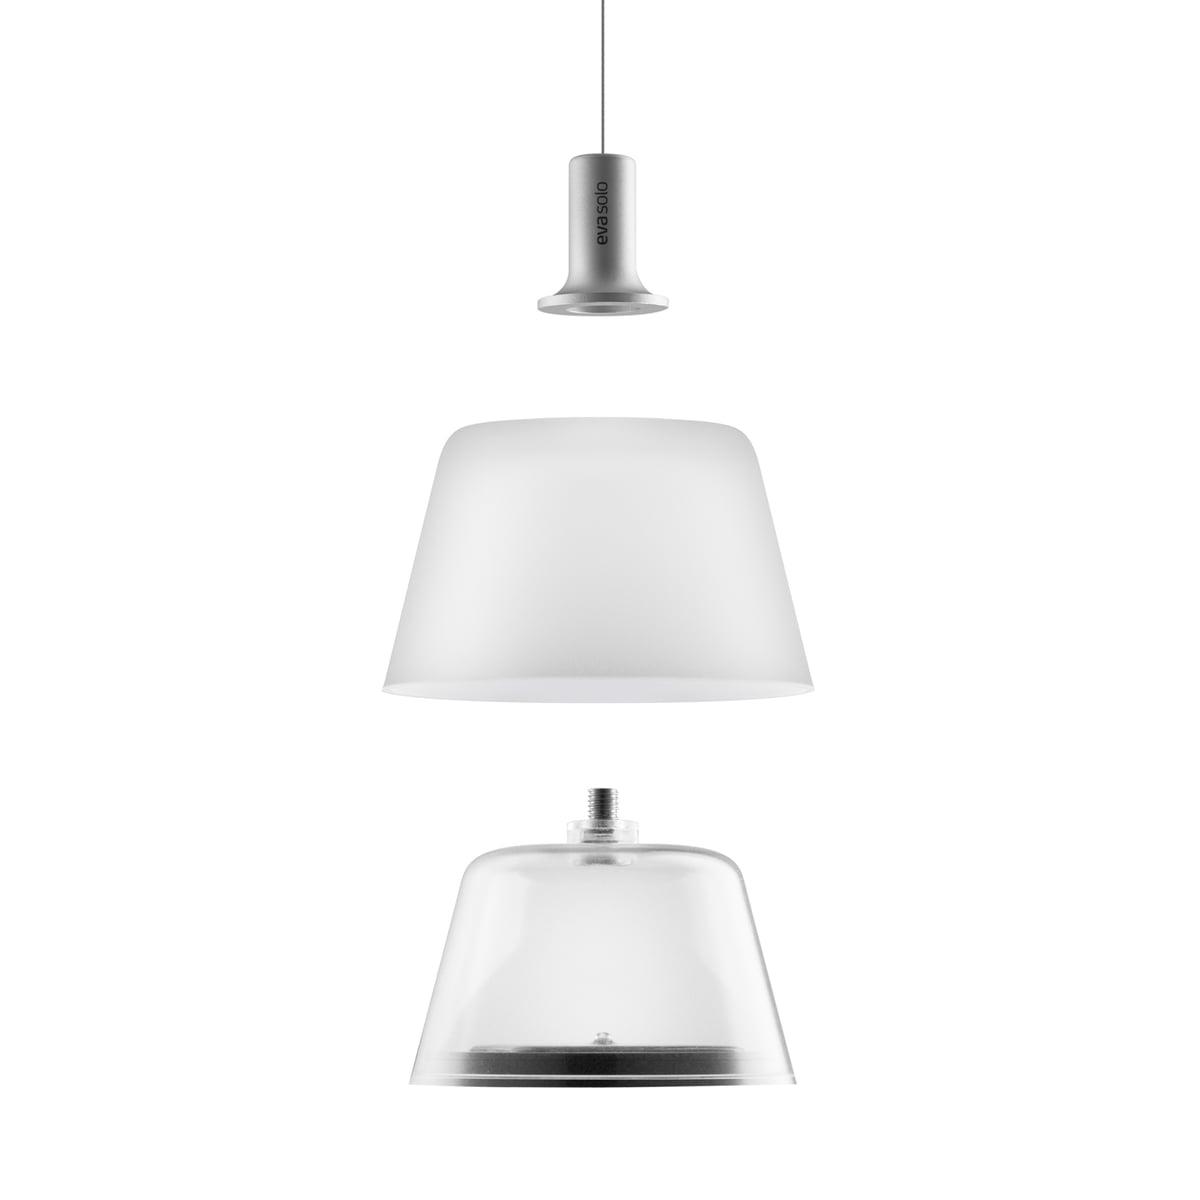 SunLight pendant lamp by Eva Solo - SunLight Pendant Lamp By Eva Solo In The Shop